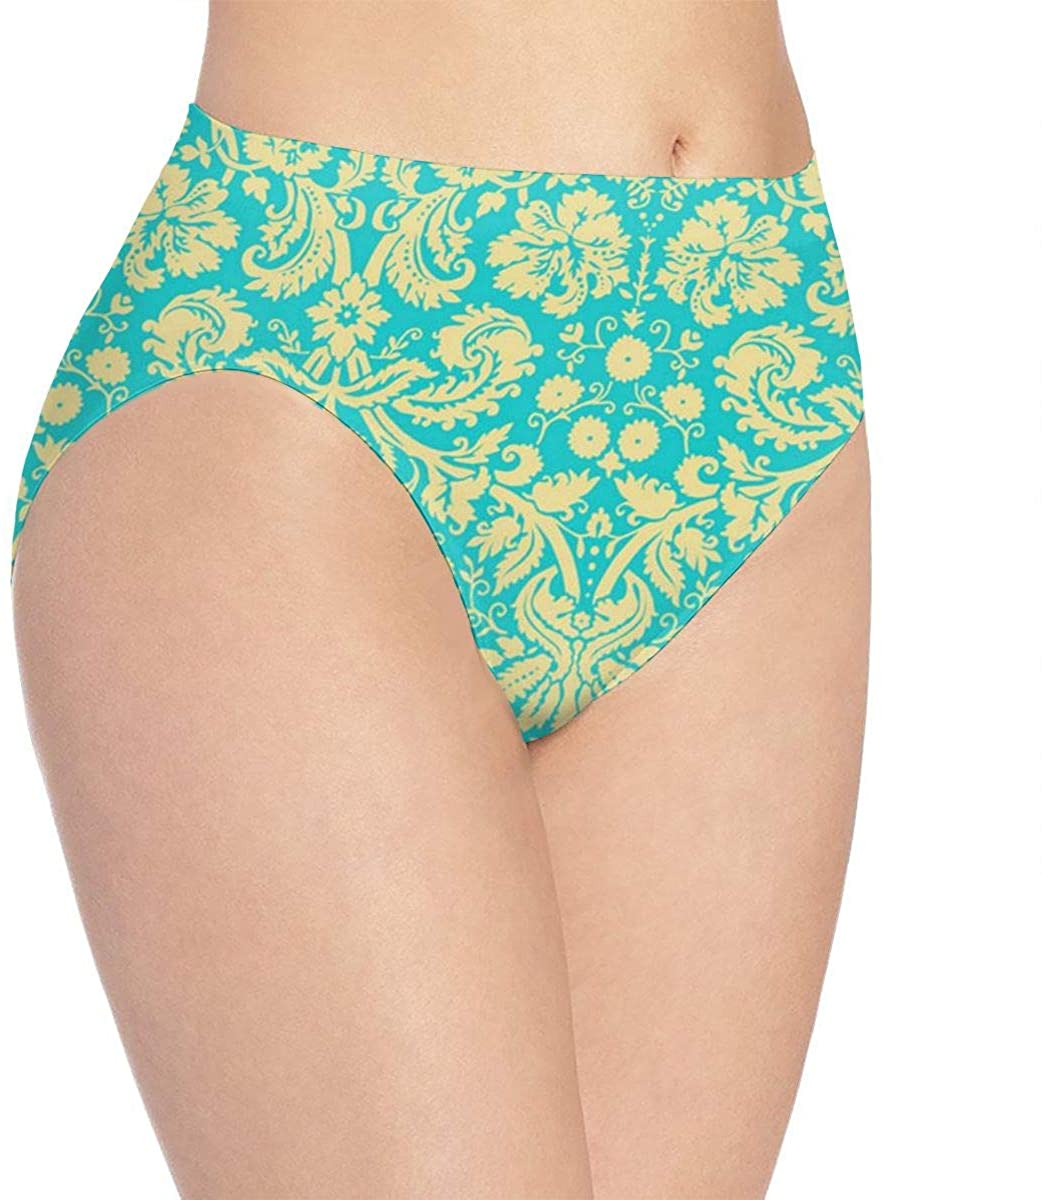 BEASDEN Women's Bikini Whales Dream Angel Seamless Panties Personalized Briefs for Lady/Girls